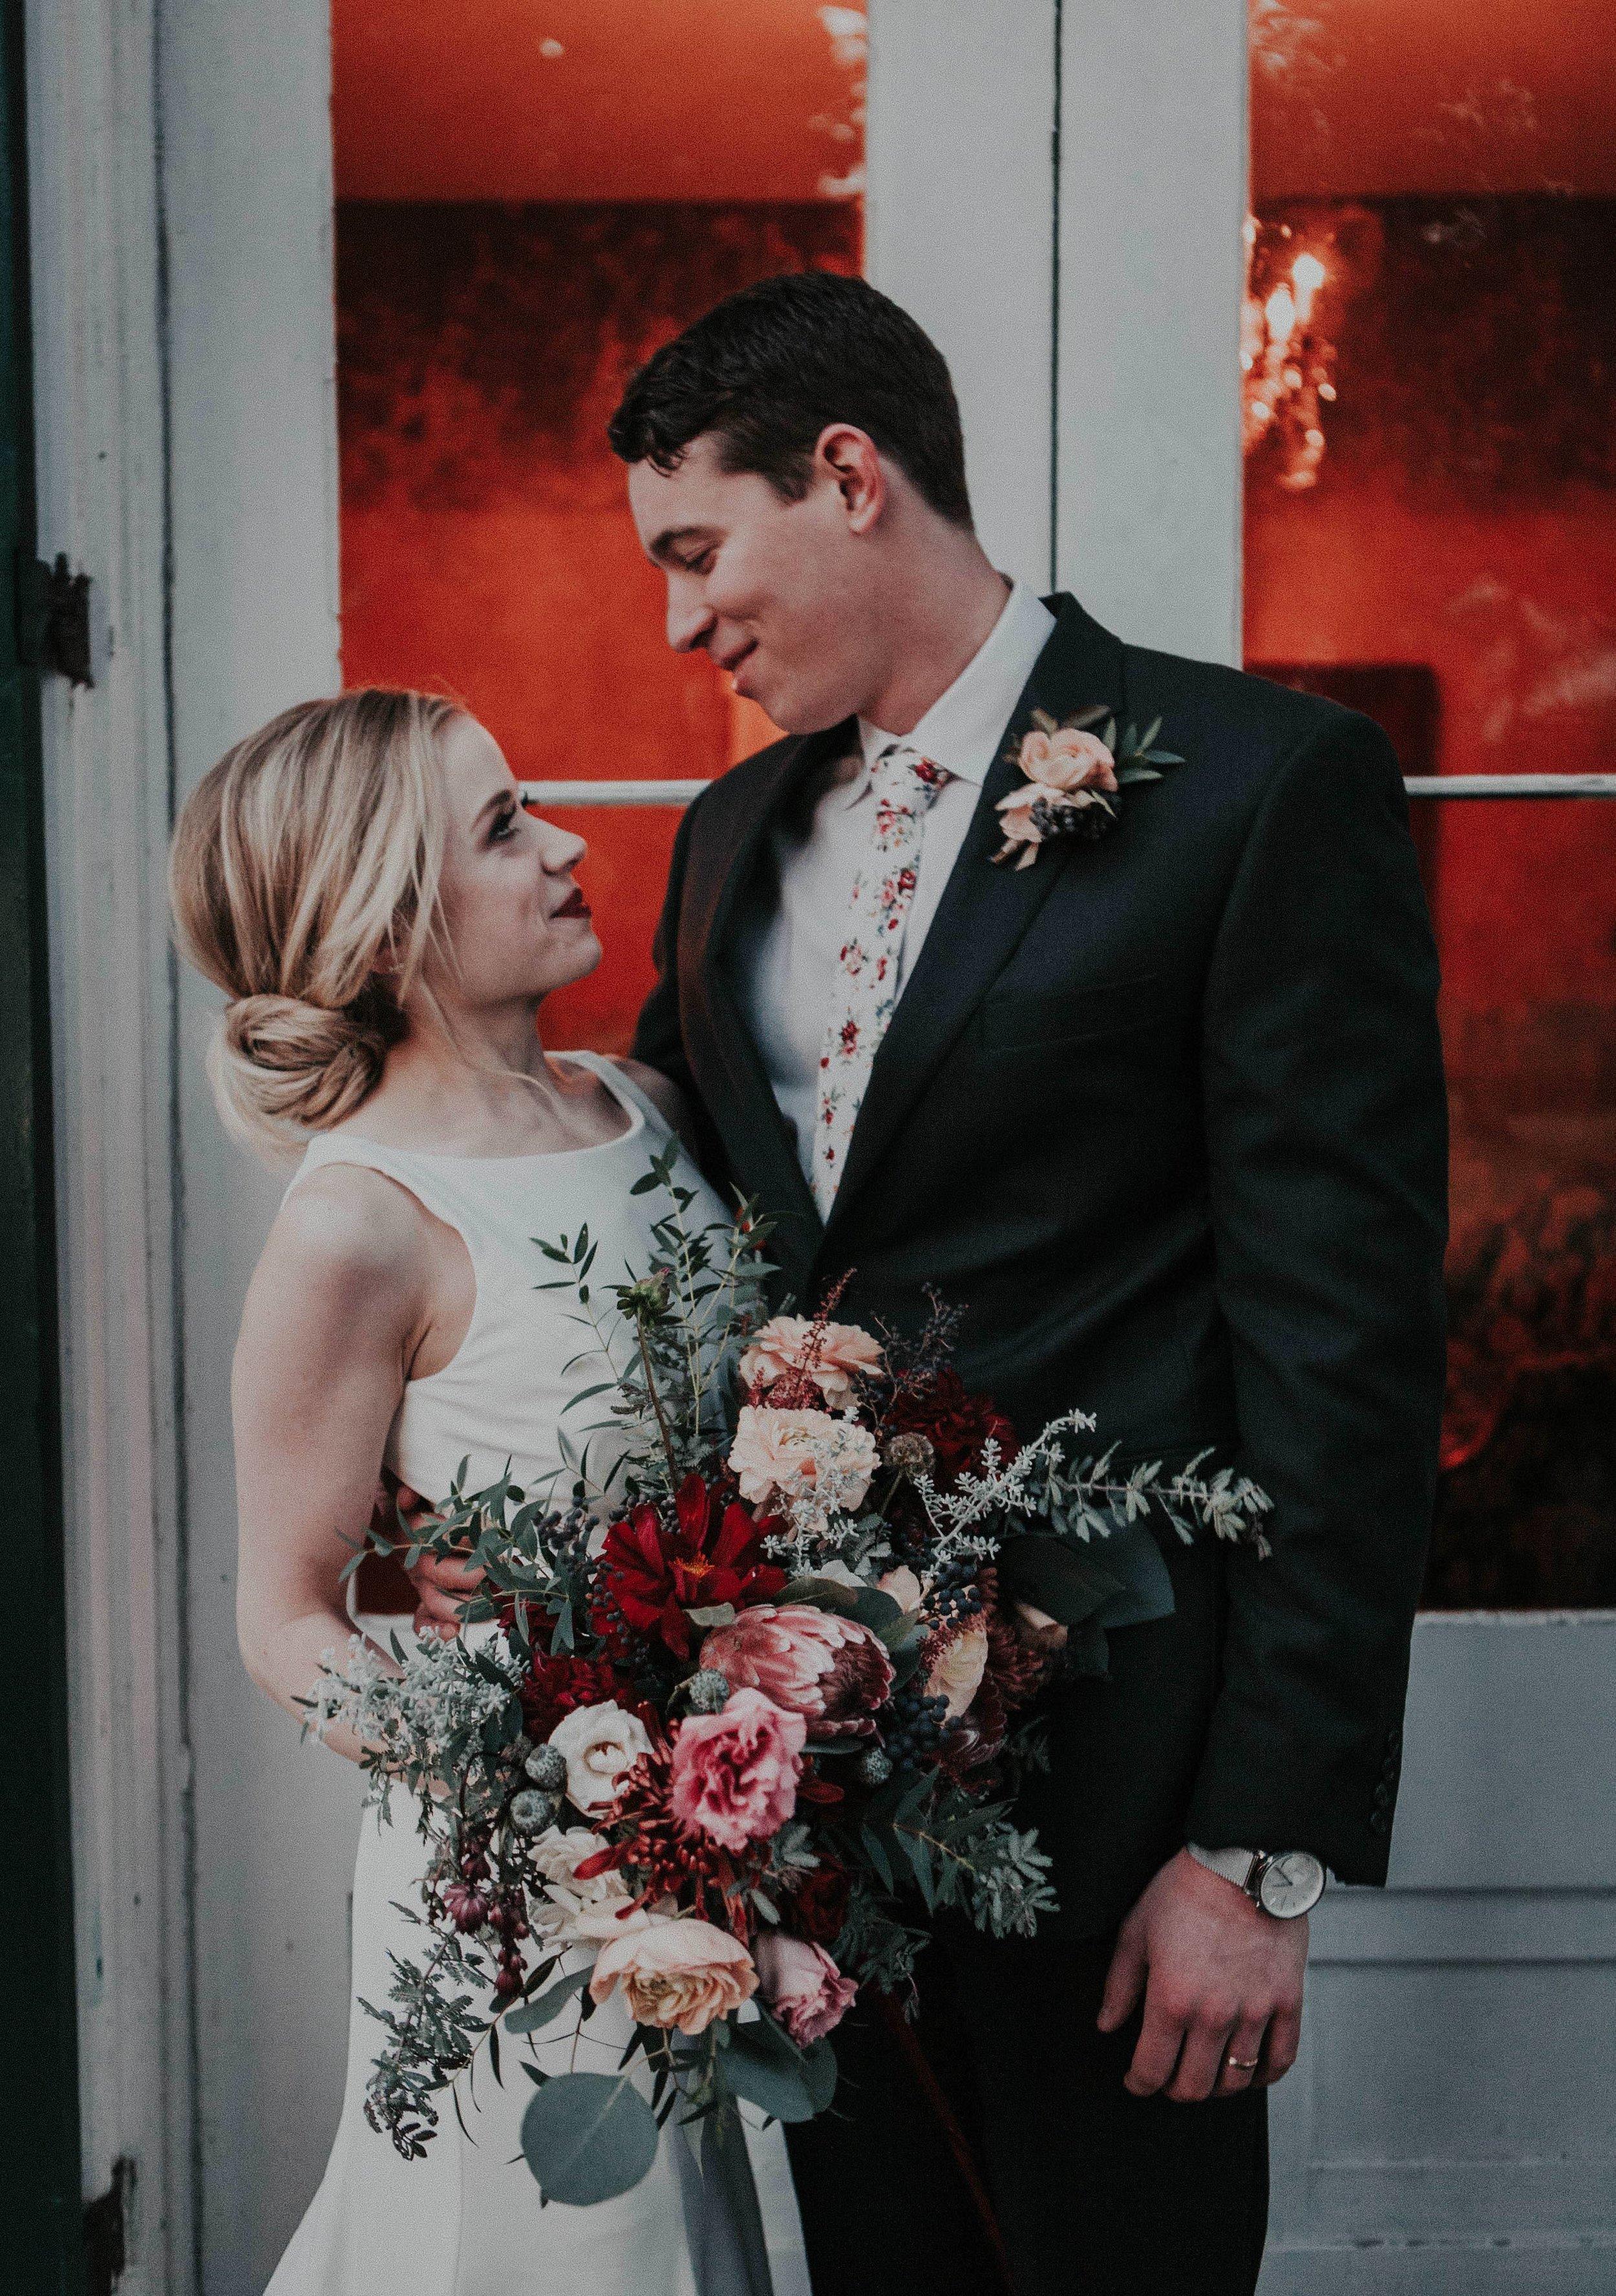 Charis_Lauren_Romantic_Wedding_Photographer_Nashville_0090.jpg